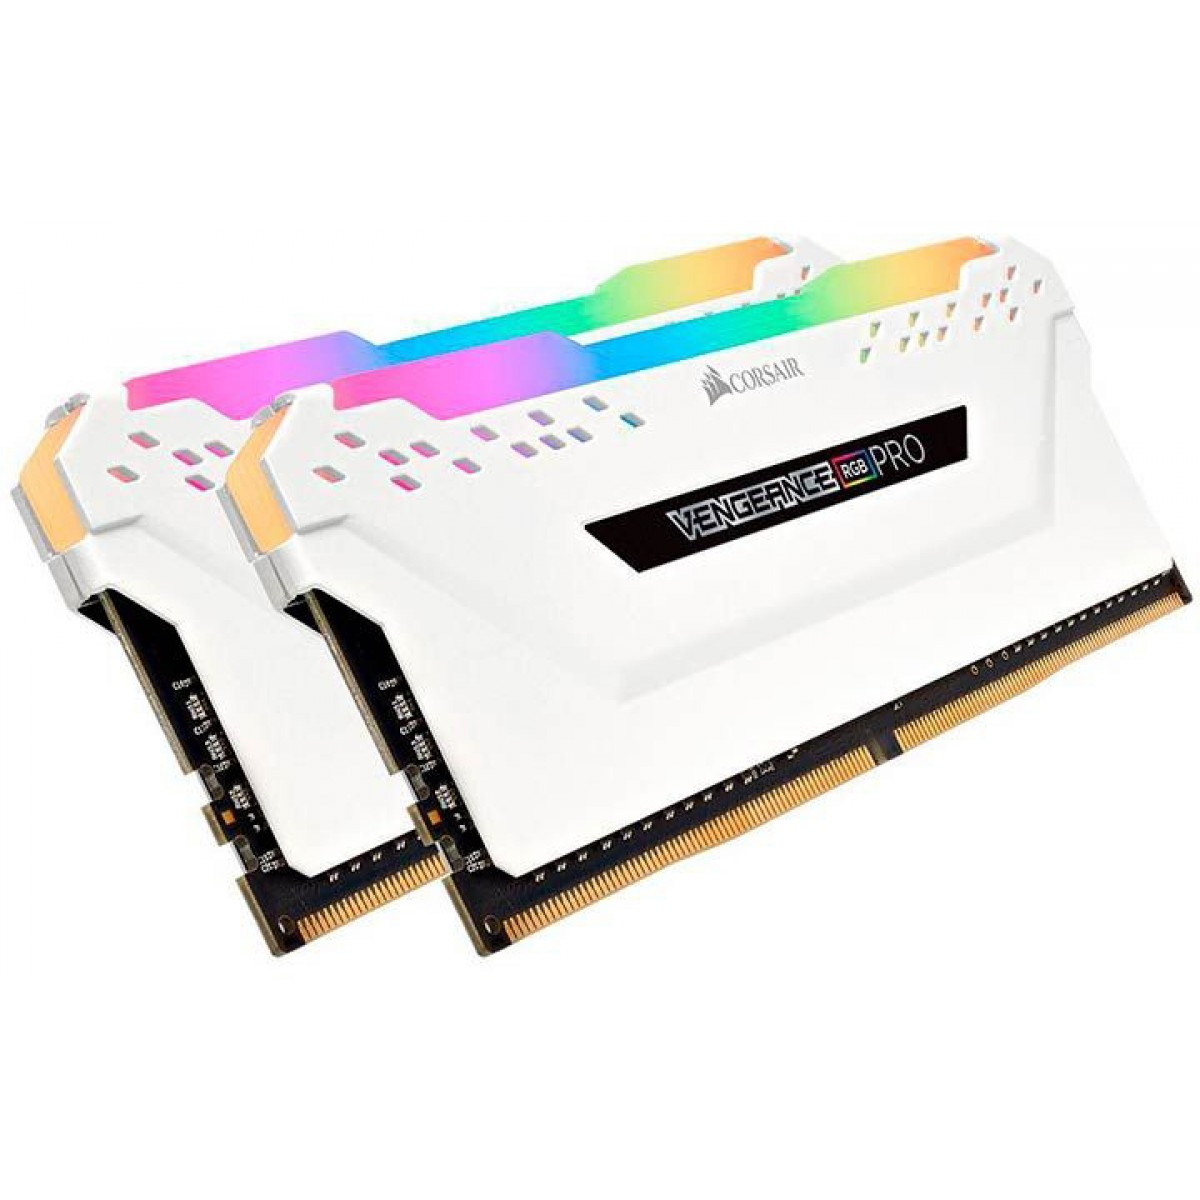 Memória DDR4 Corsair Vengeance PRO RGB 16GB (2x8GB) 3600MHz, White, CMW16GX4M2C3600C18W